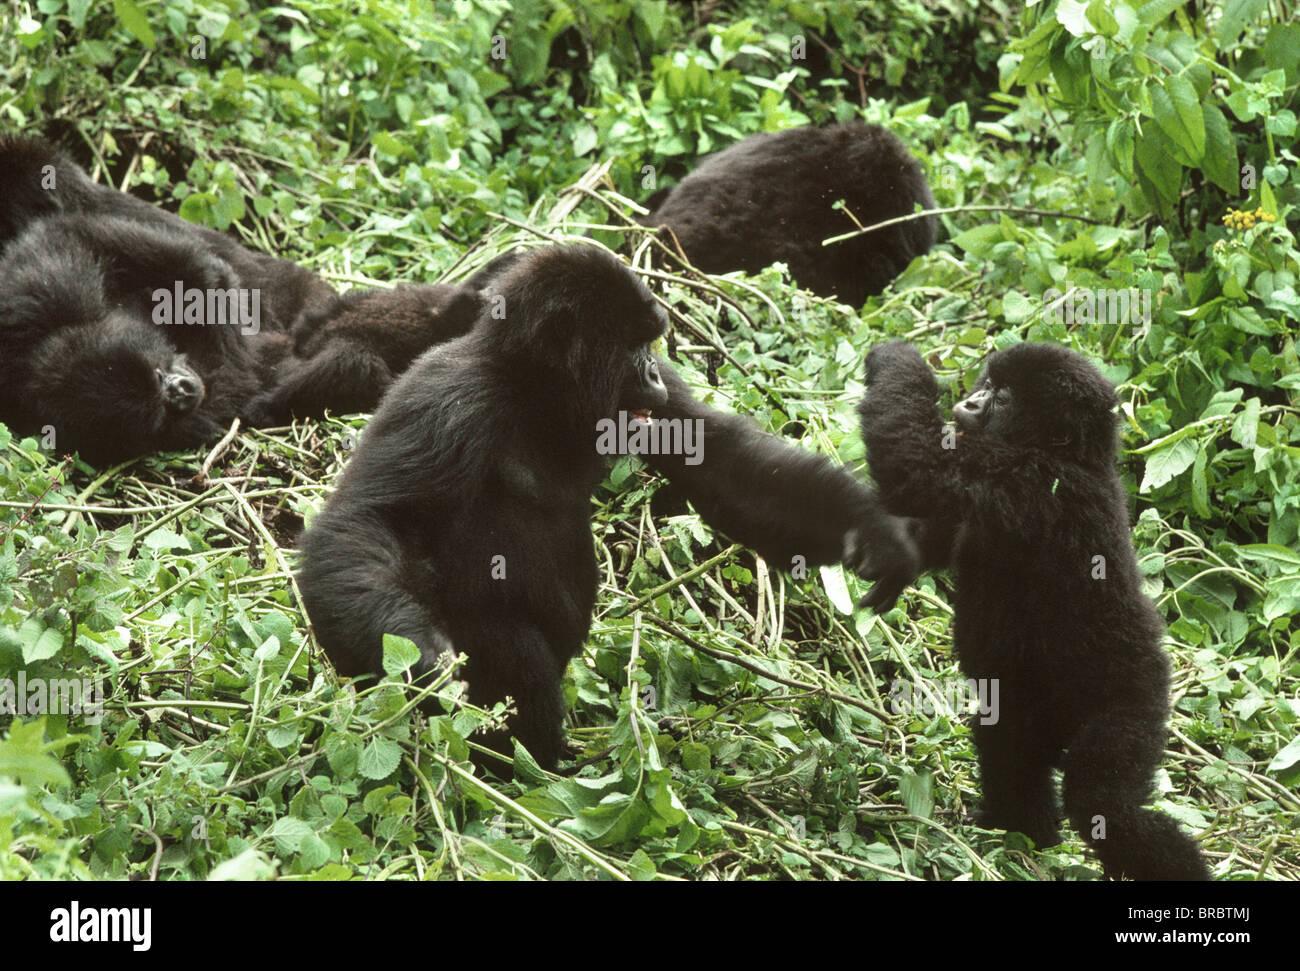 Mountain Gorillas (Gorilla gorilla beringei), juveniles playing, Virunga Volcanoes, Rwanda - Stock Image